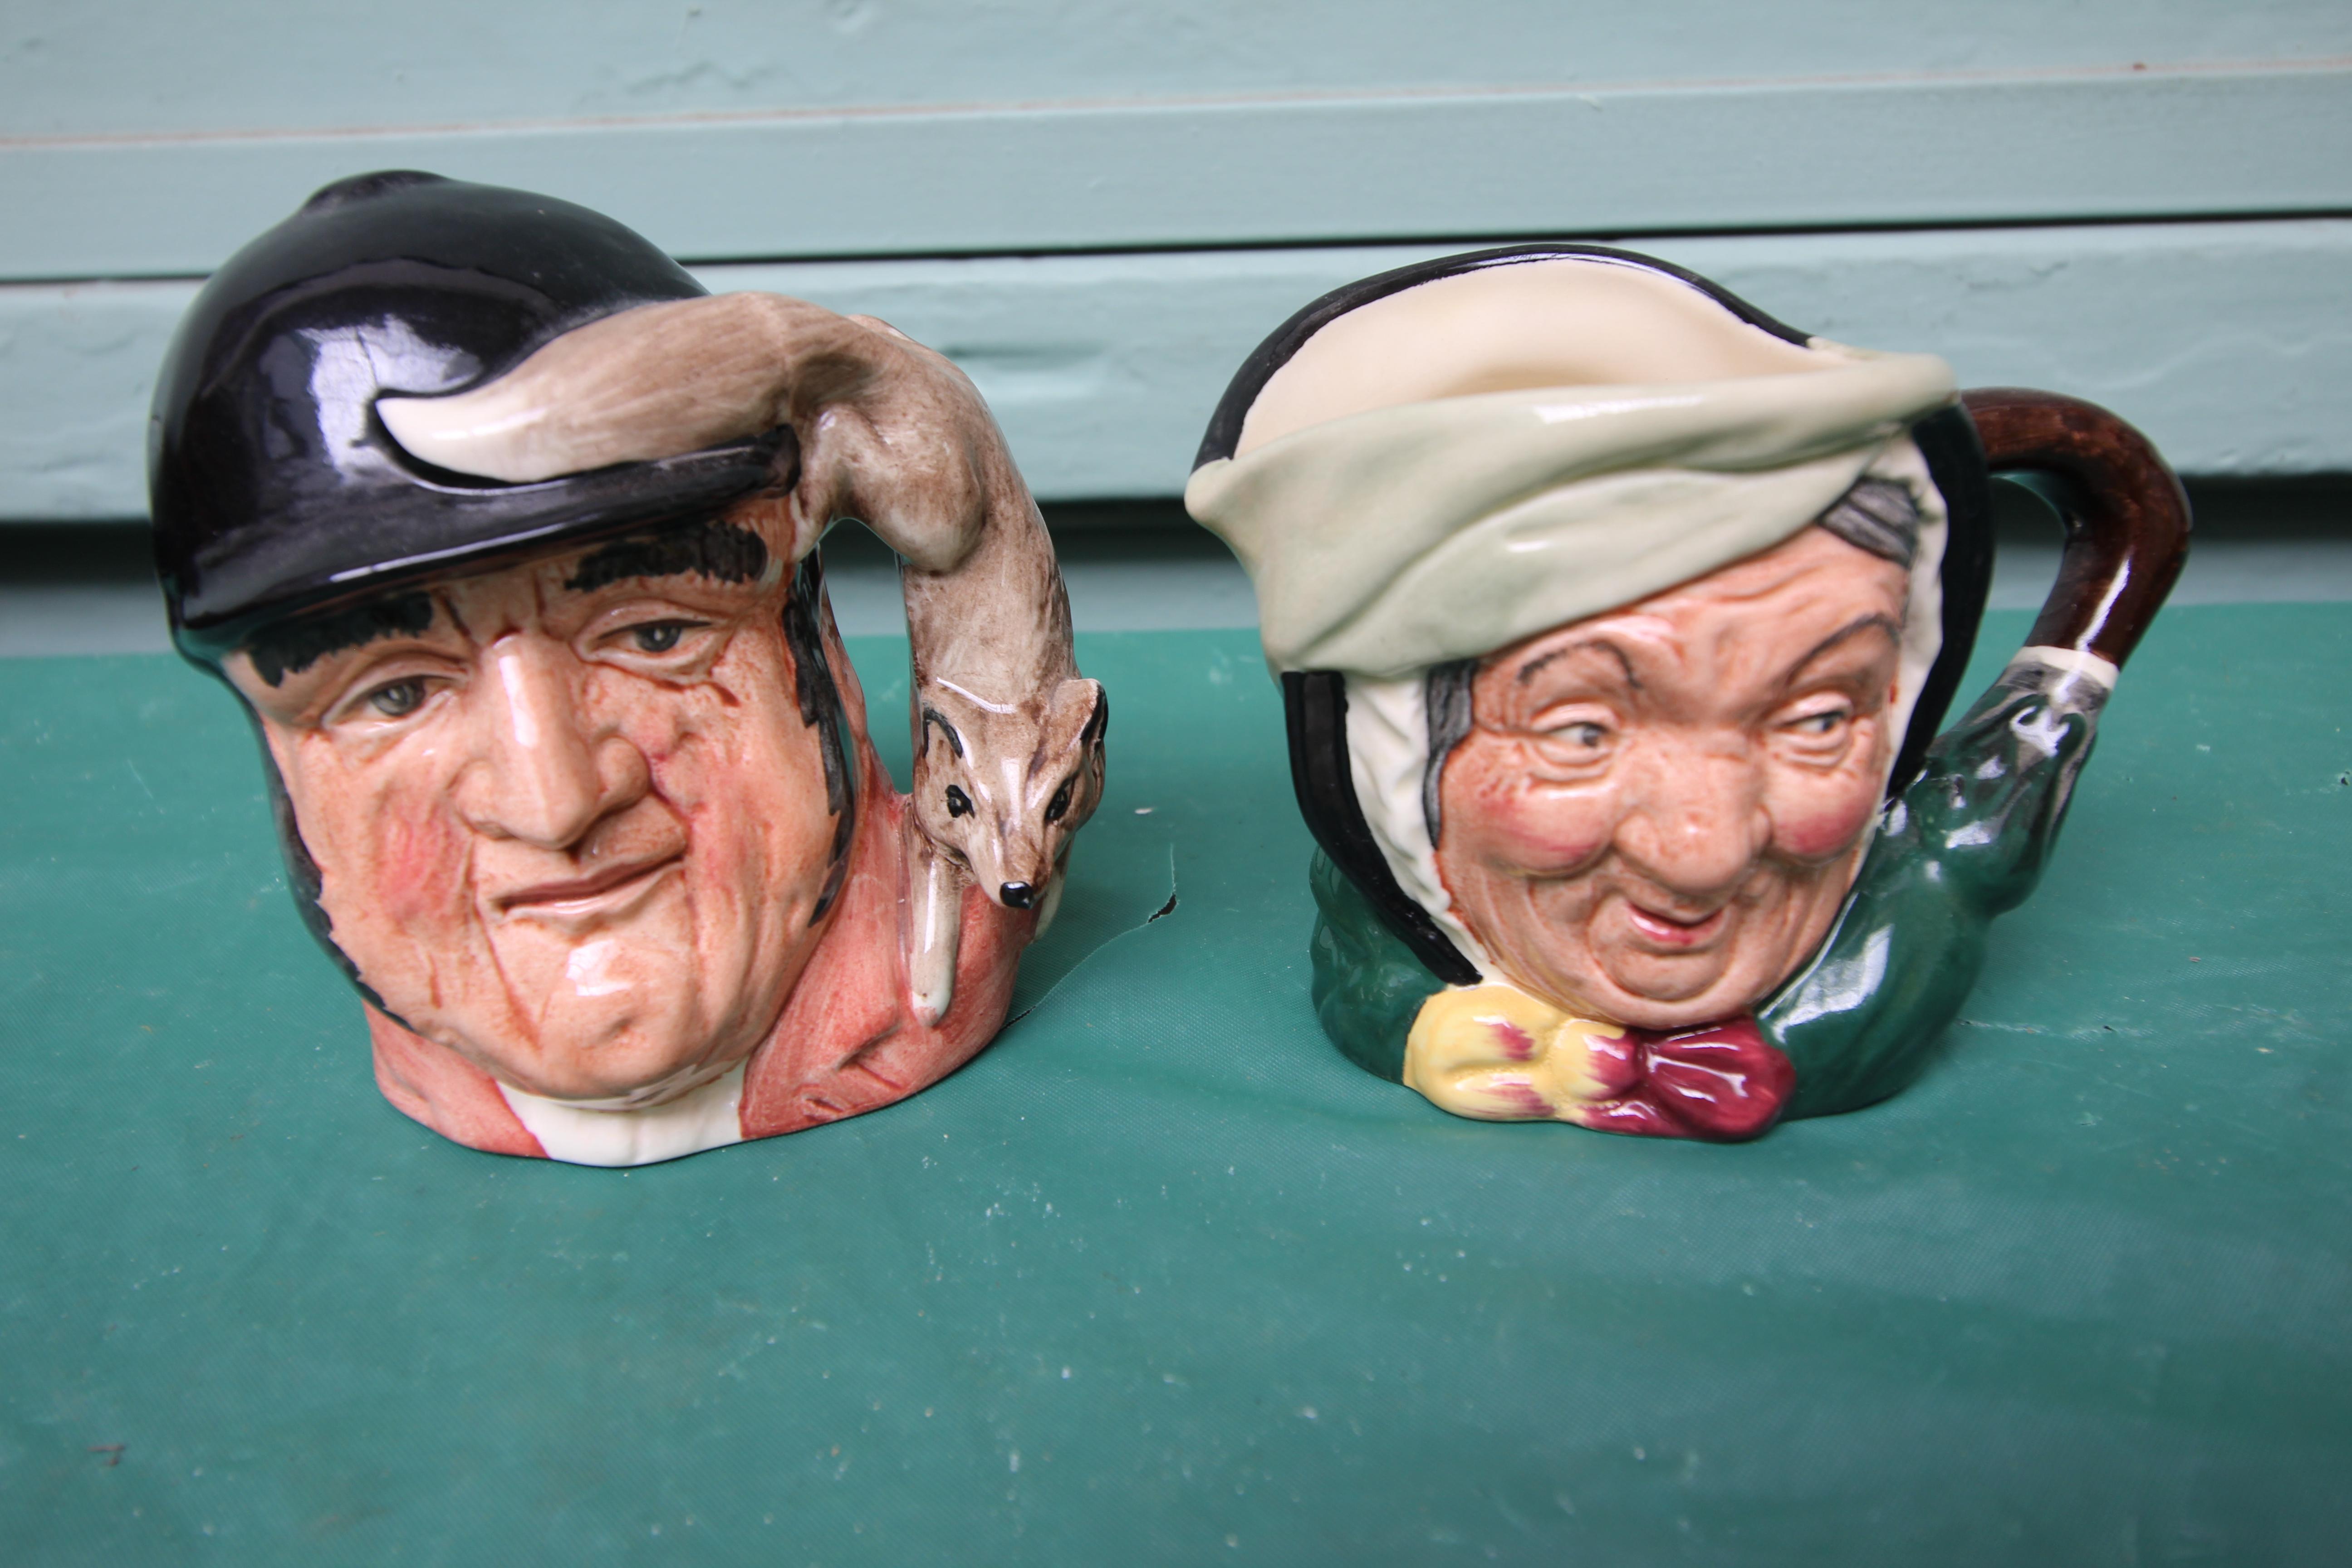 5 miniature Royal Doulton character jugs incl. Gone away, Sairey Gamp, Neptune etc. - Image 3 of 4